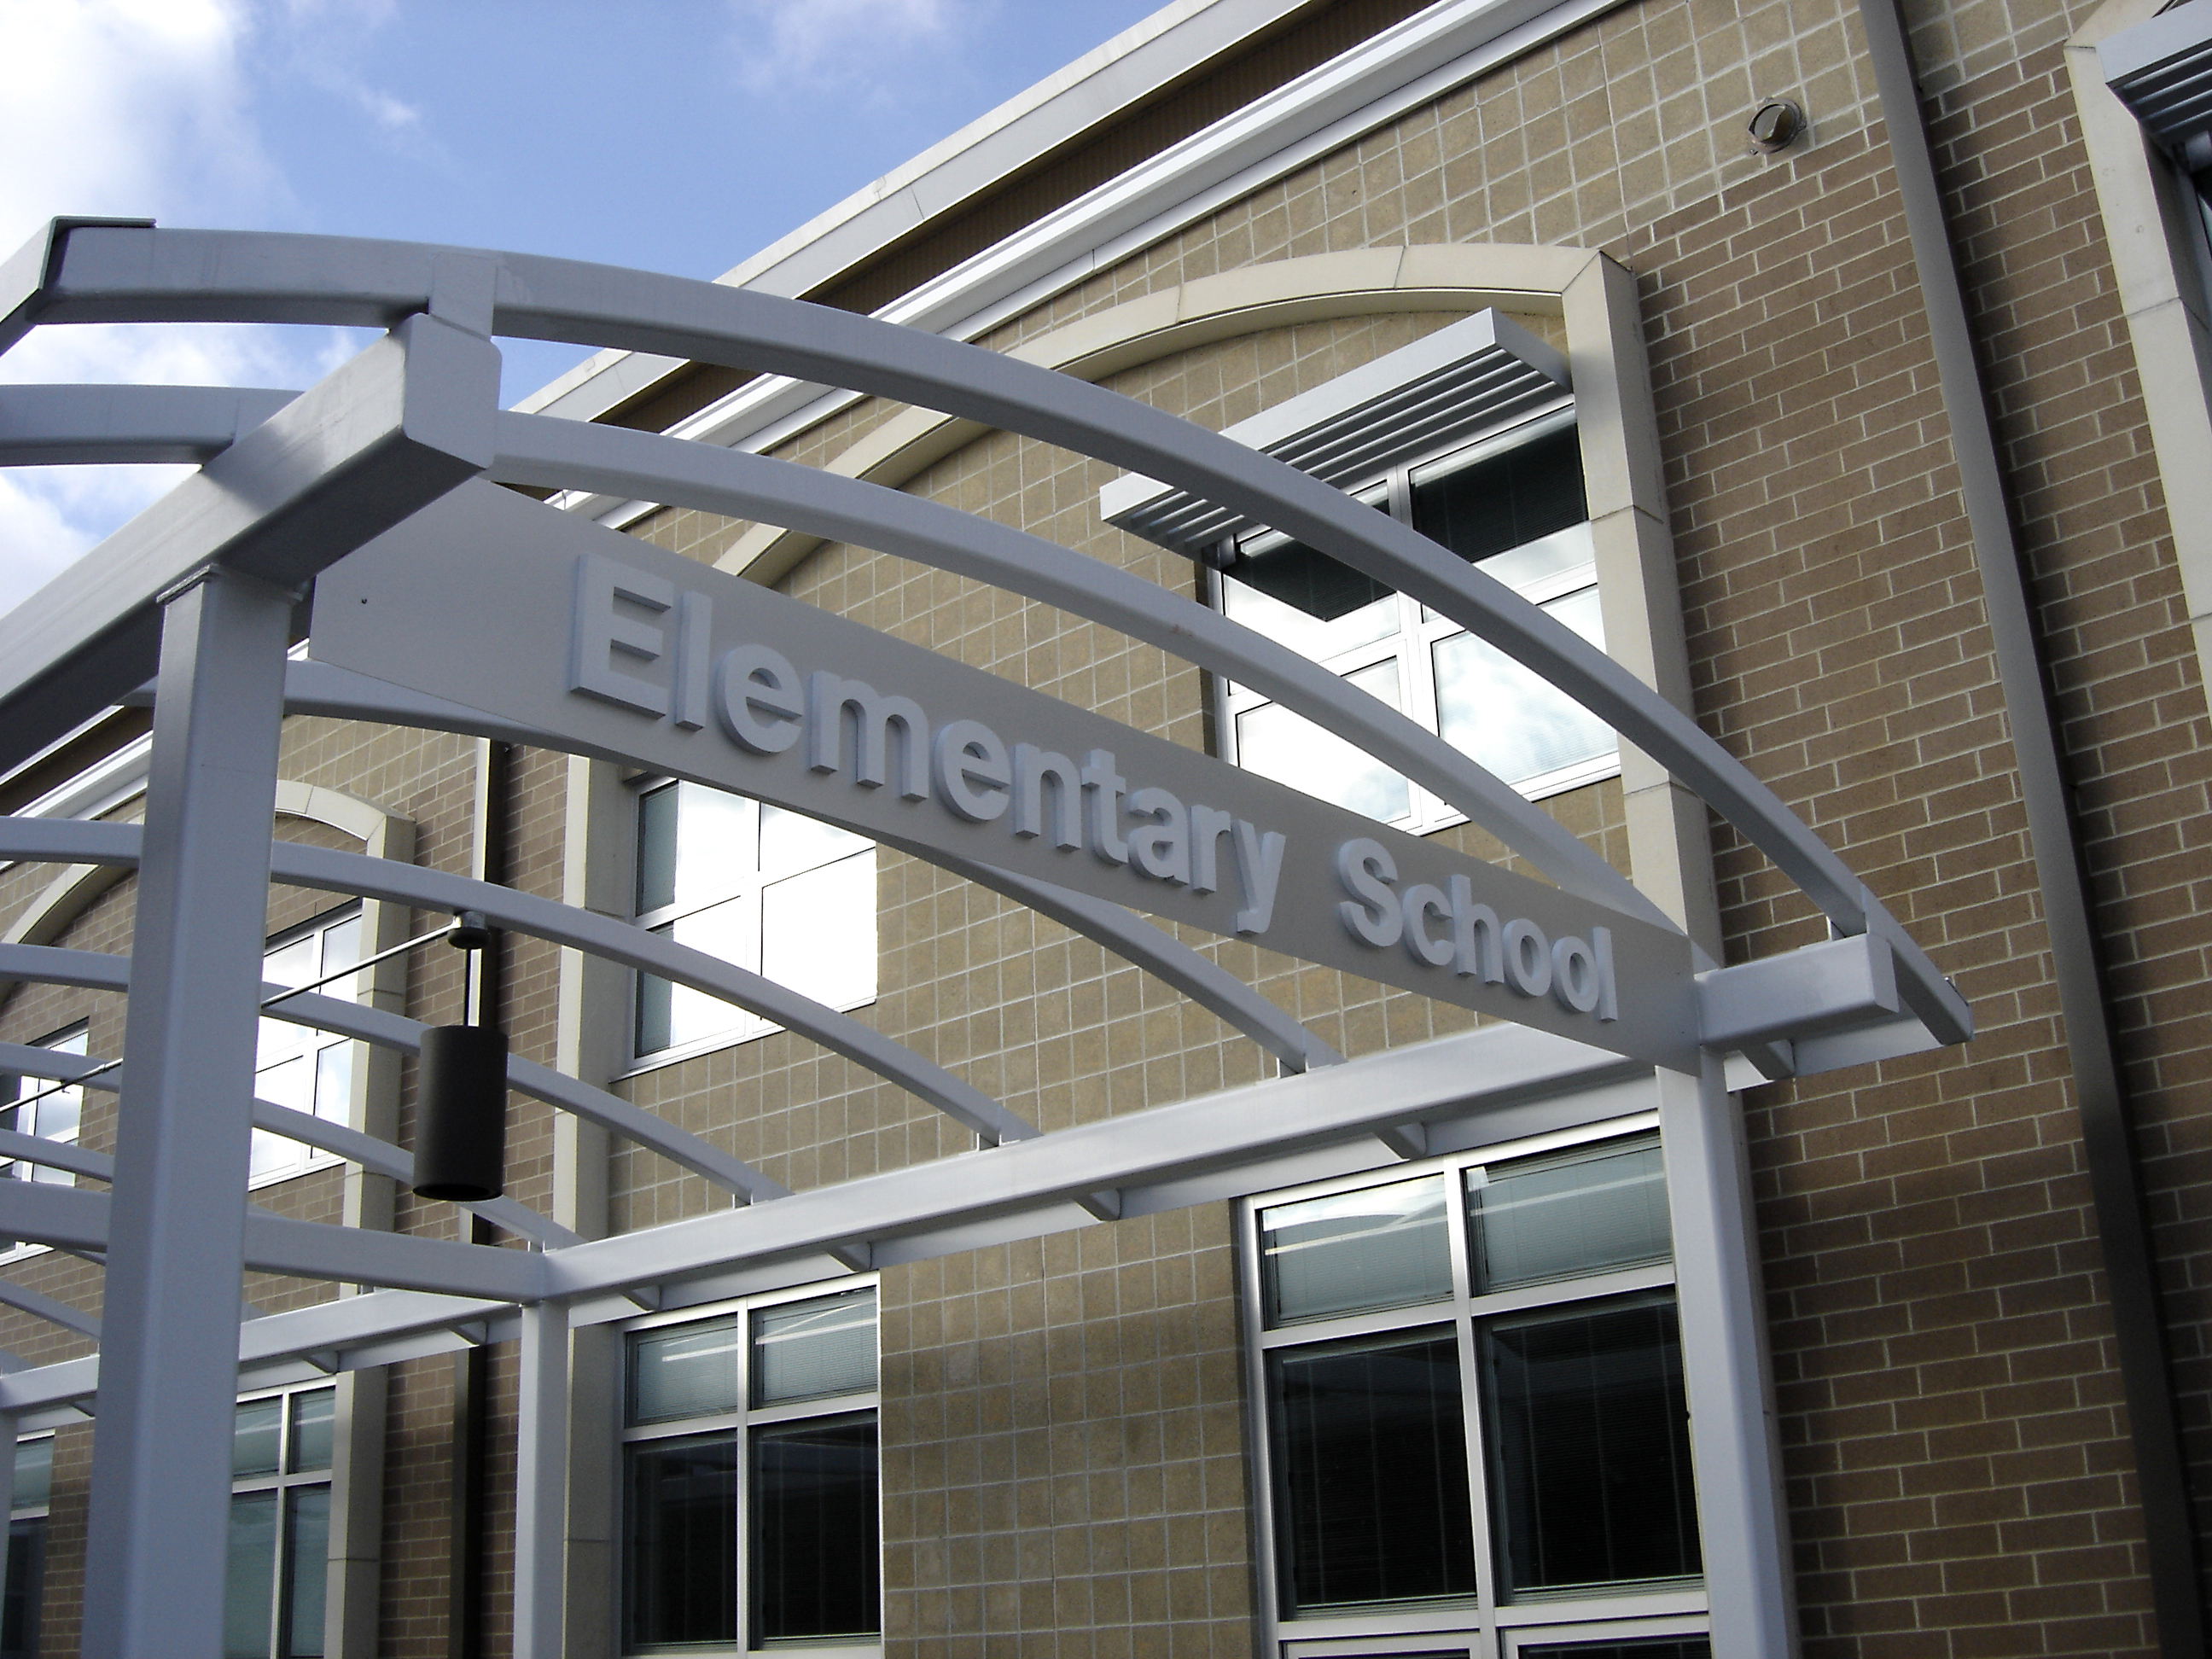 Louisville PK-5 Elementary sign 2